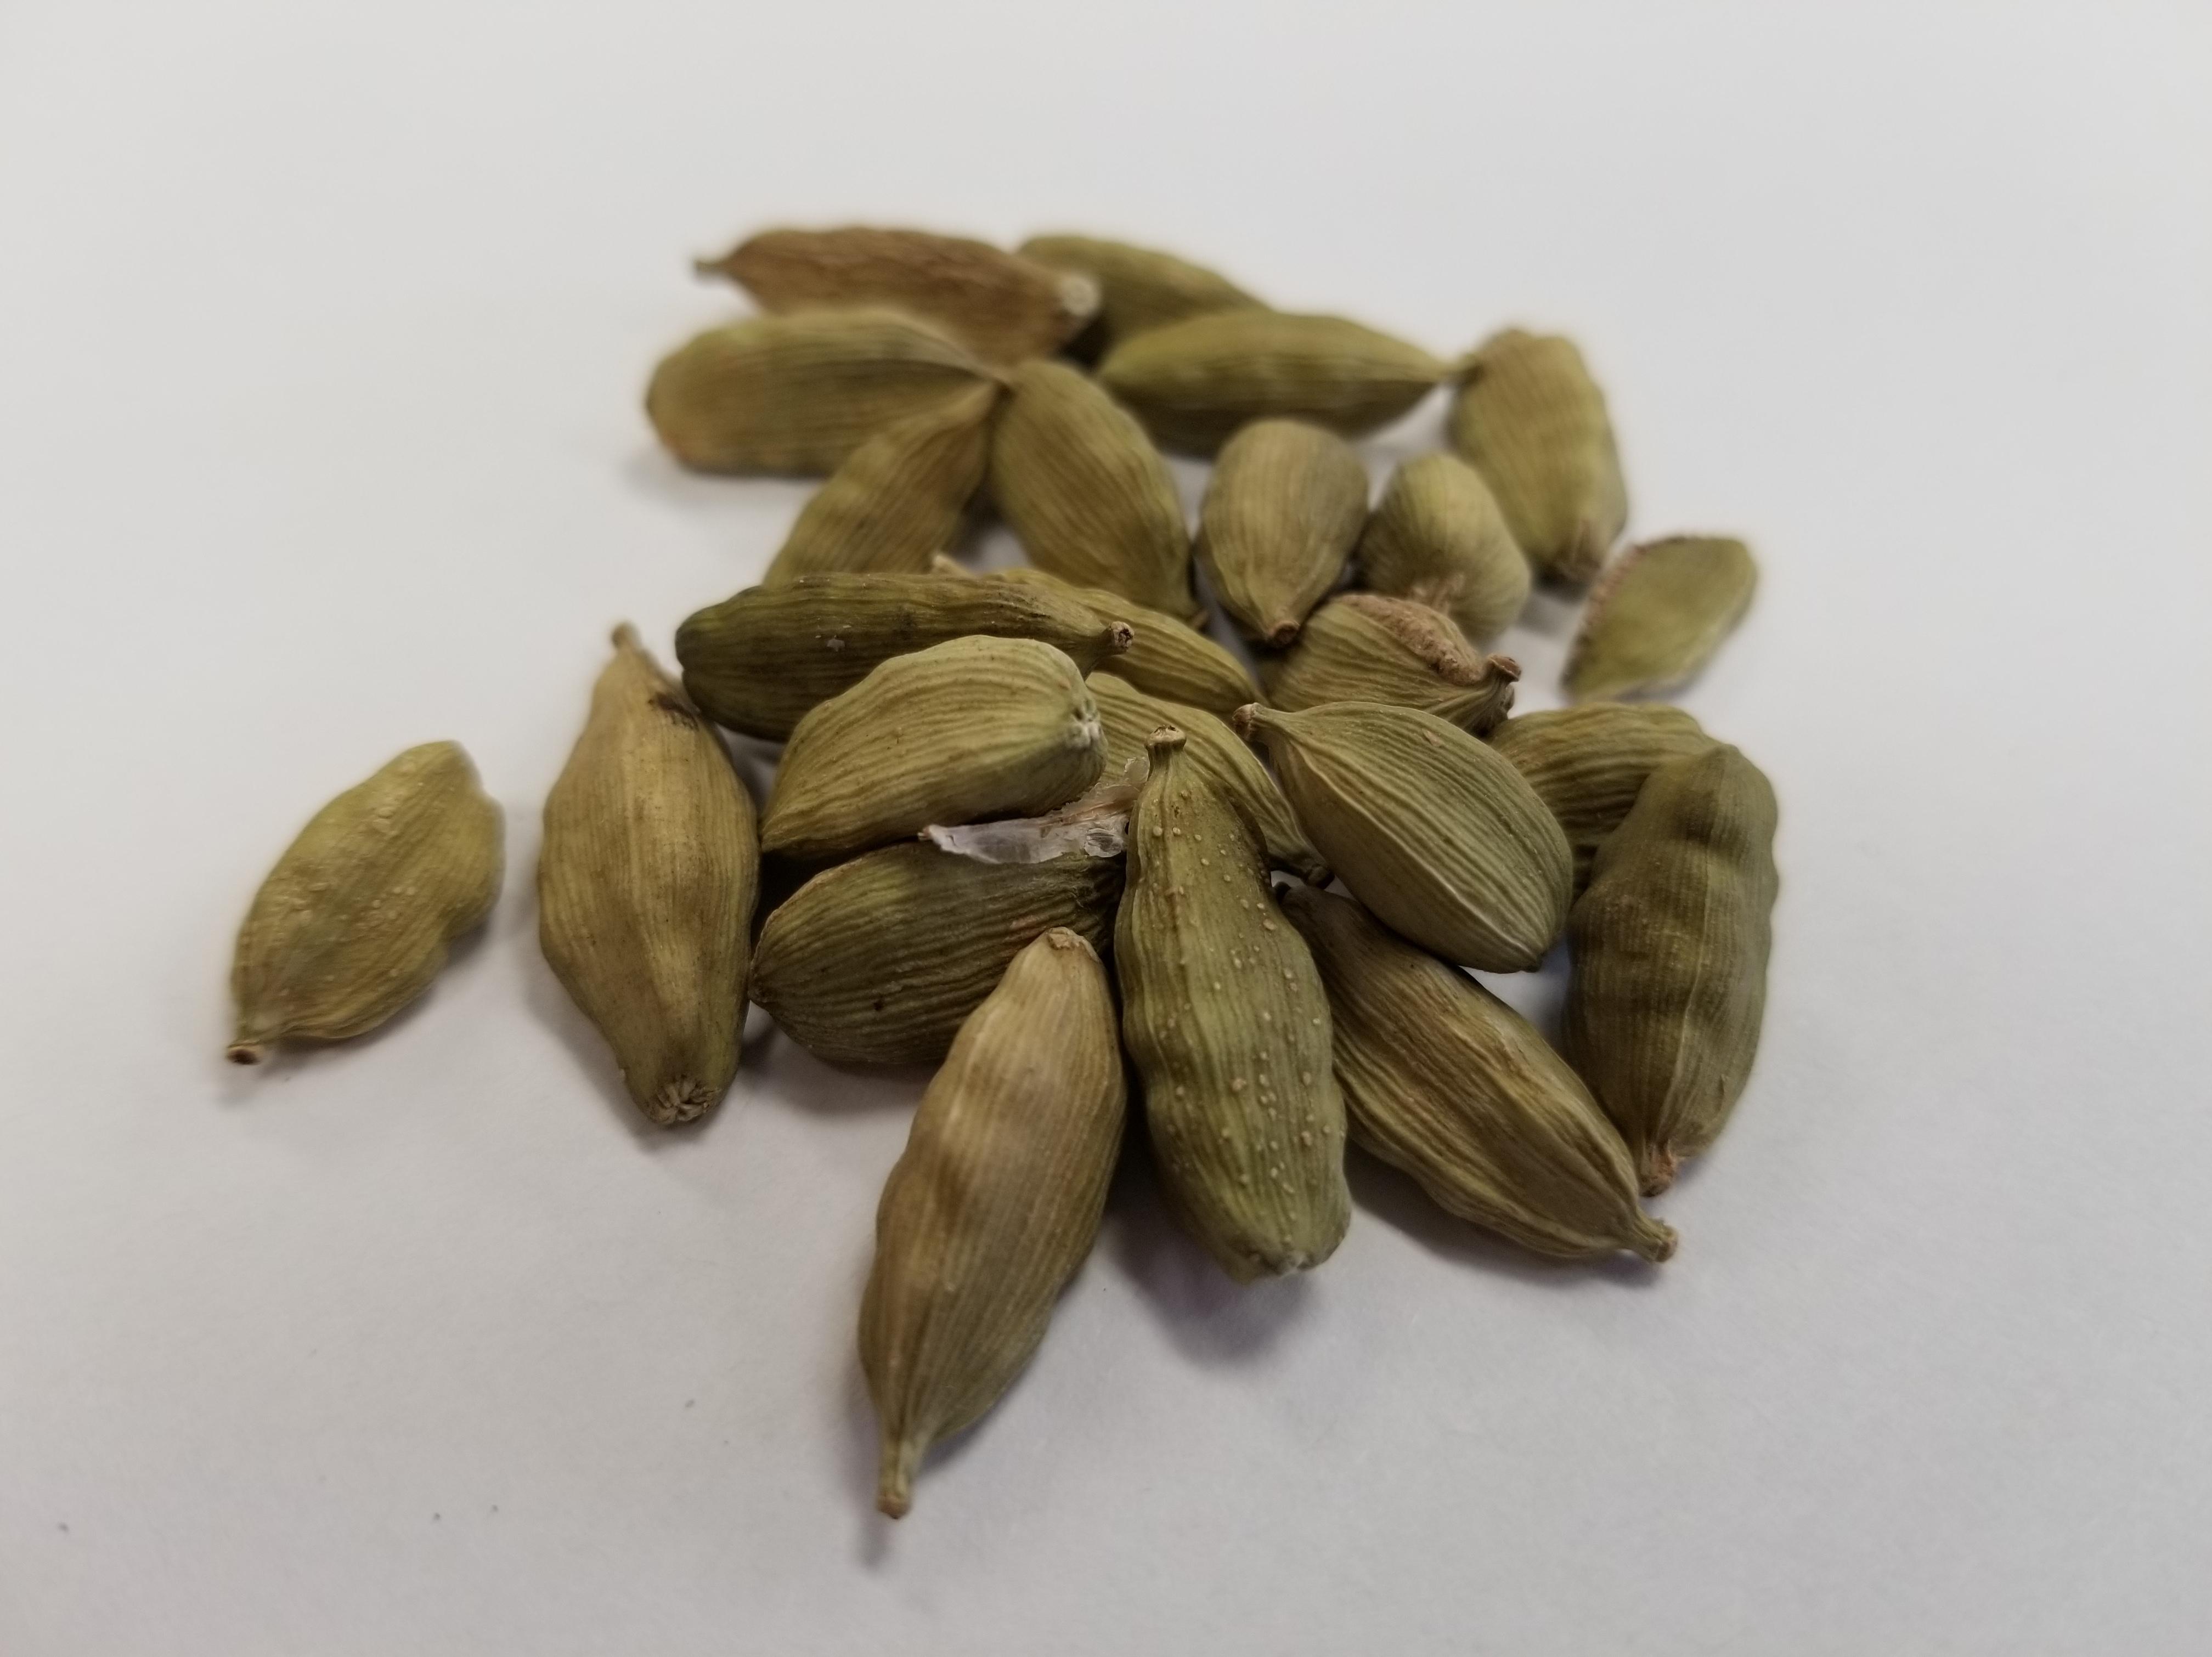 Green cardamom seed pods